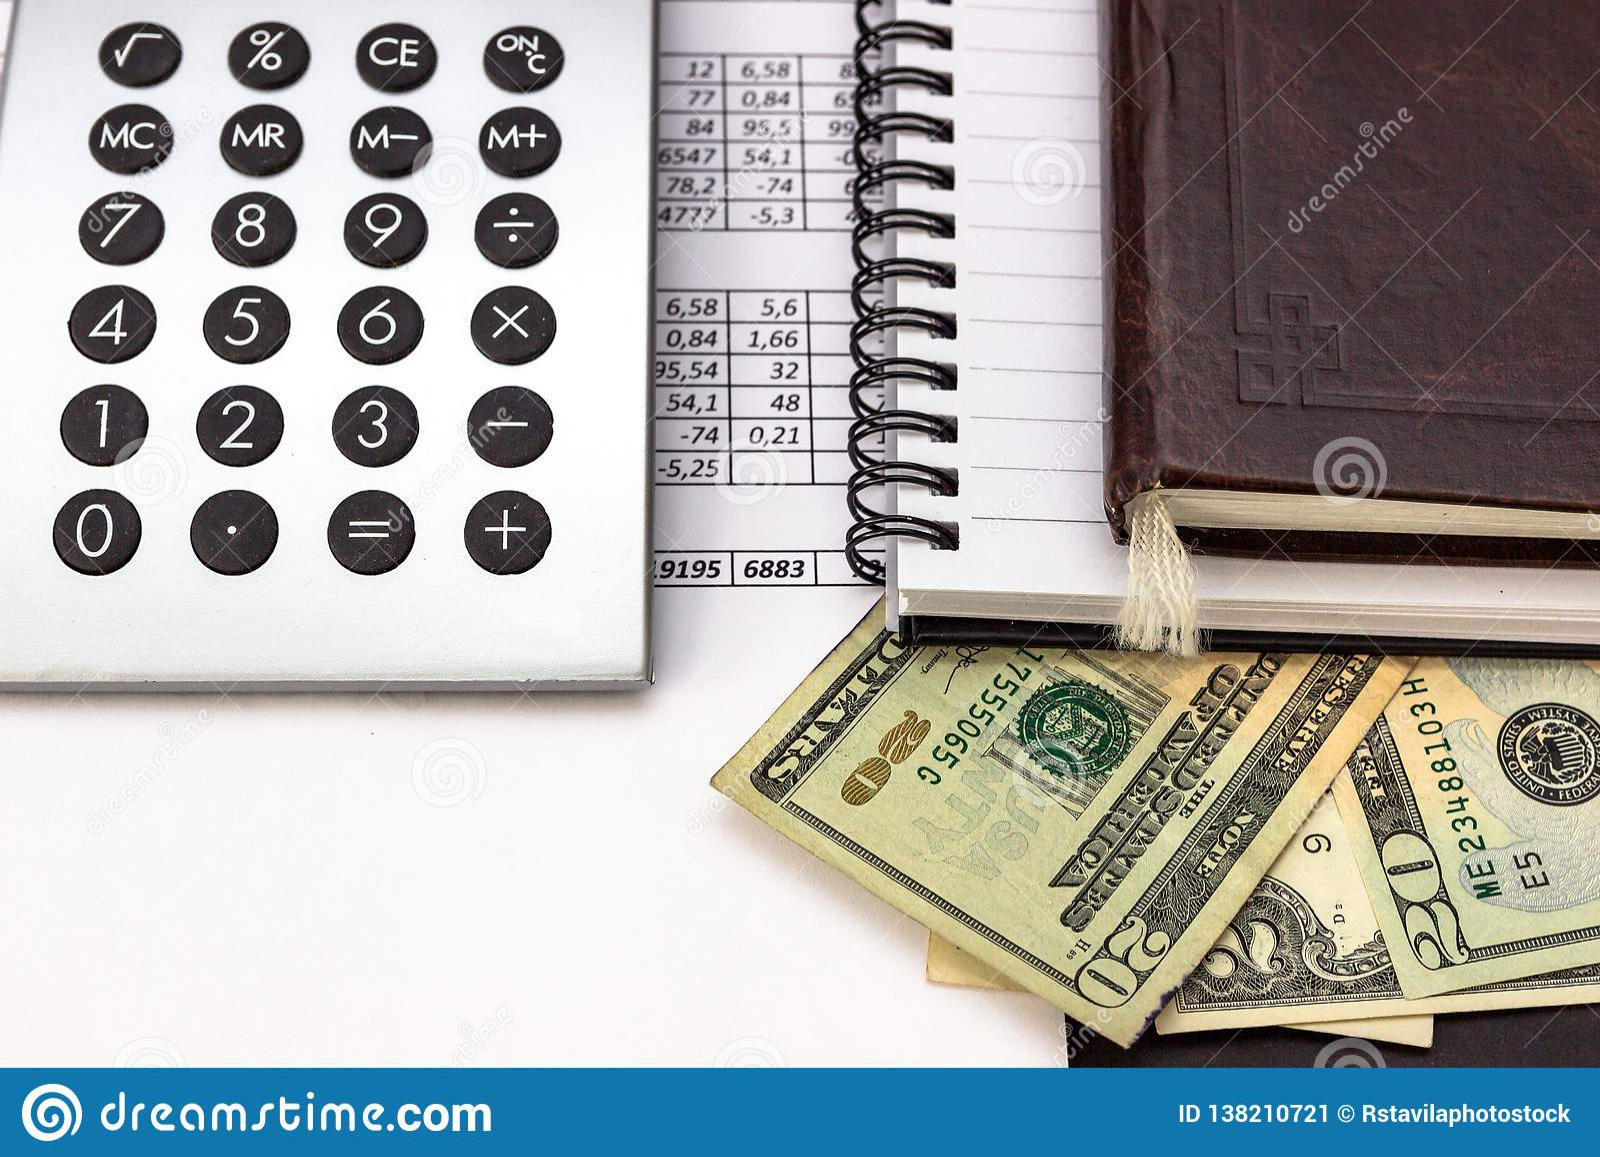 Mess on your desktop. Calculator, notebook, documents, Bitcoin, USD, paper money, office supplies